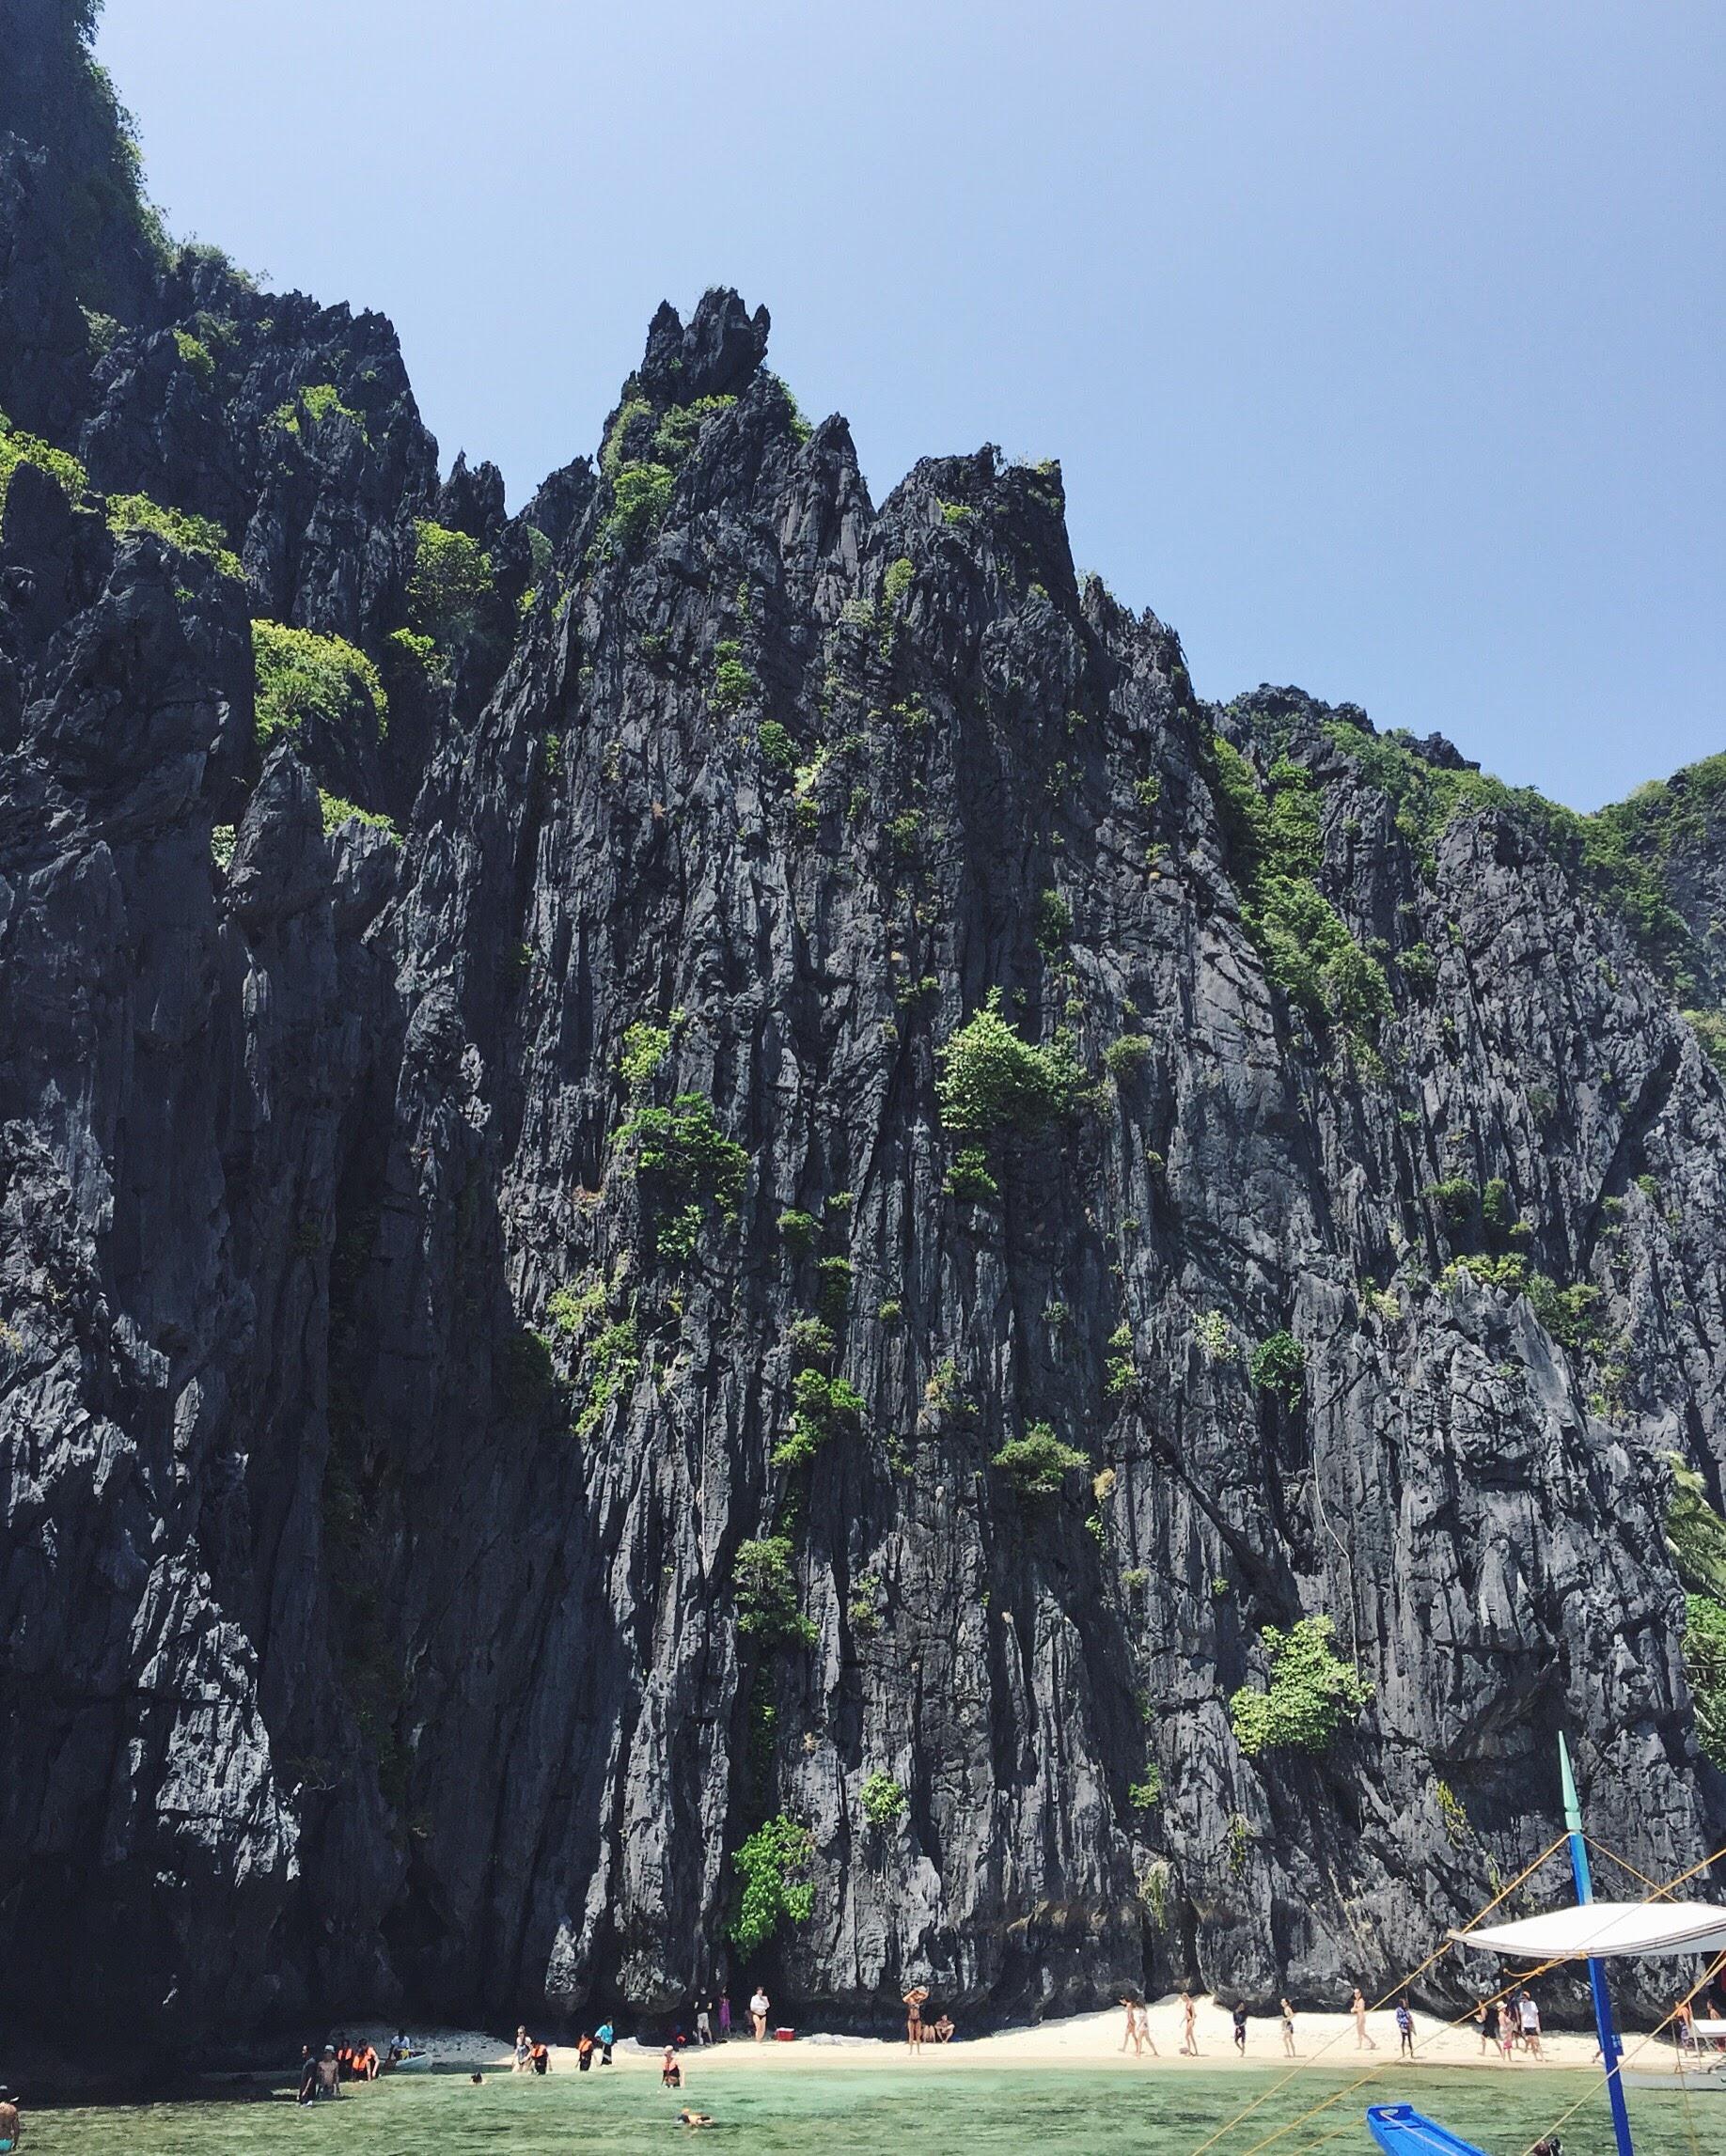 Limestone cliffs of El Nido, Palawan